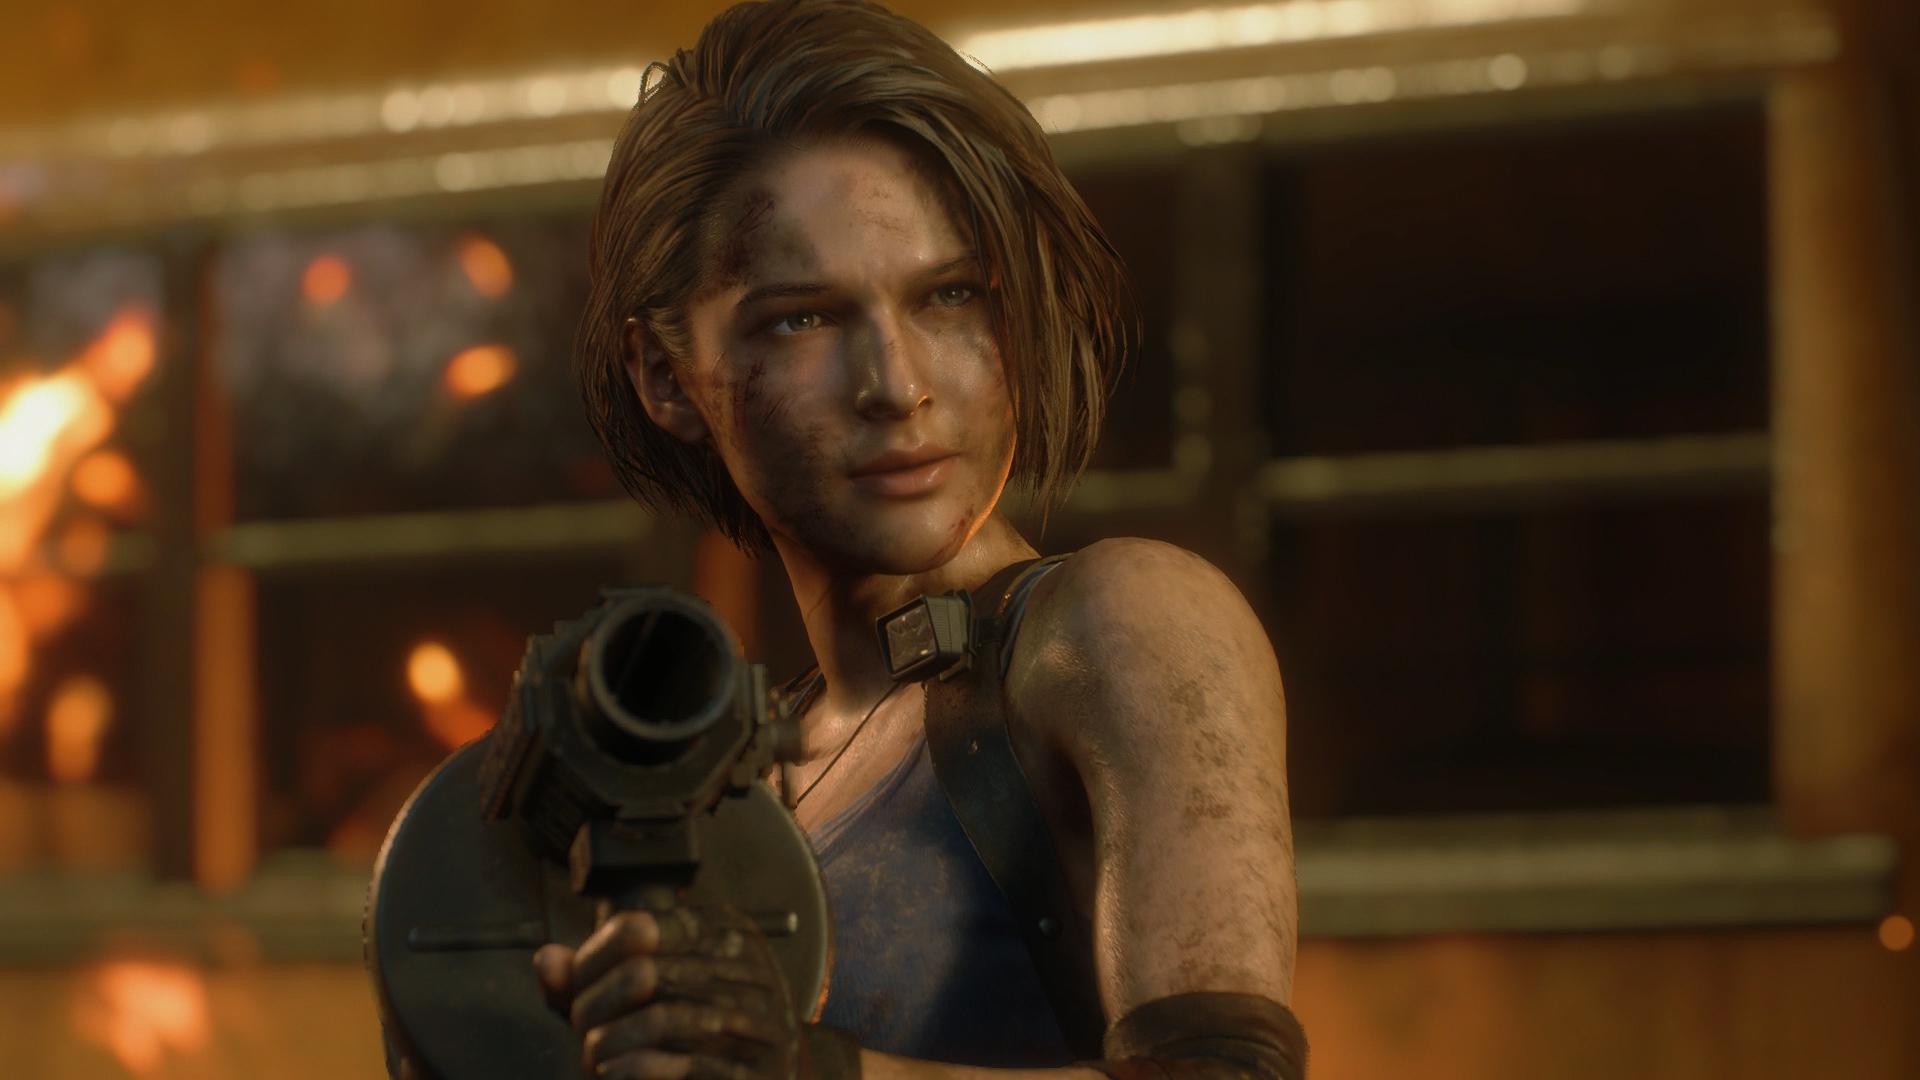 Grenade Launcher Location Resident Evil 3 Shacknews